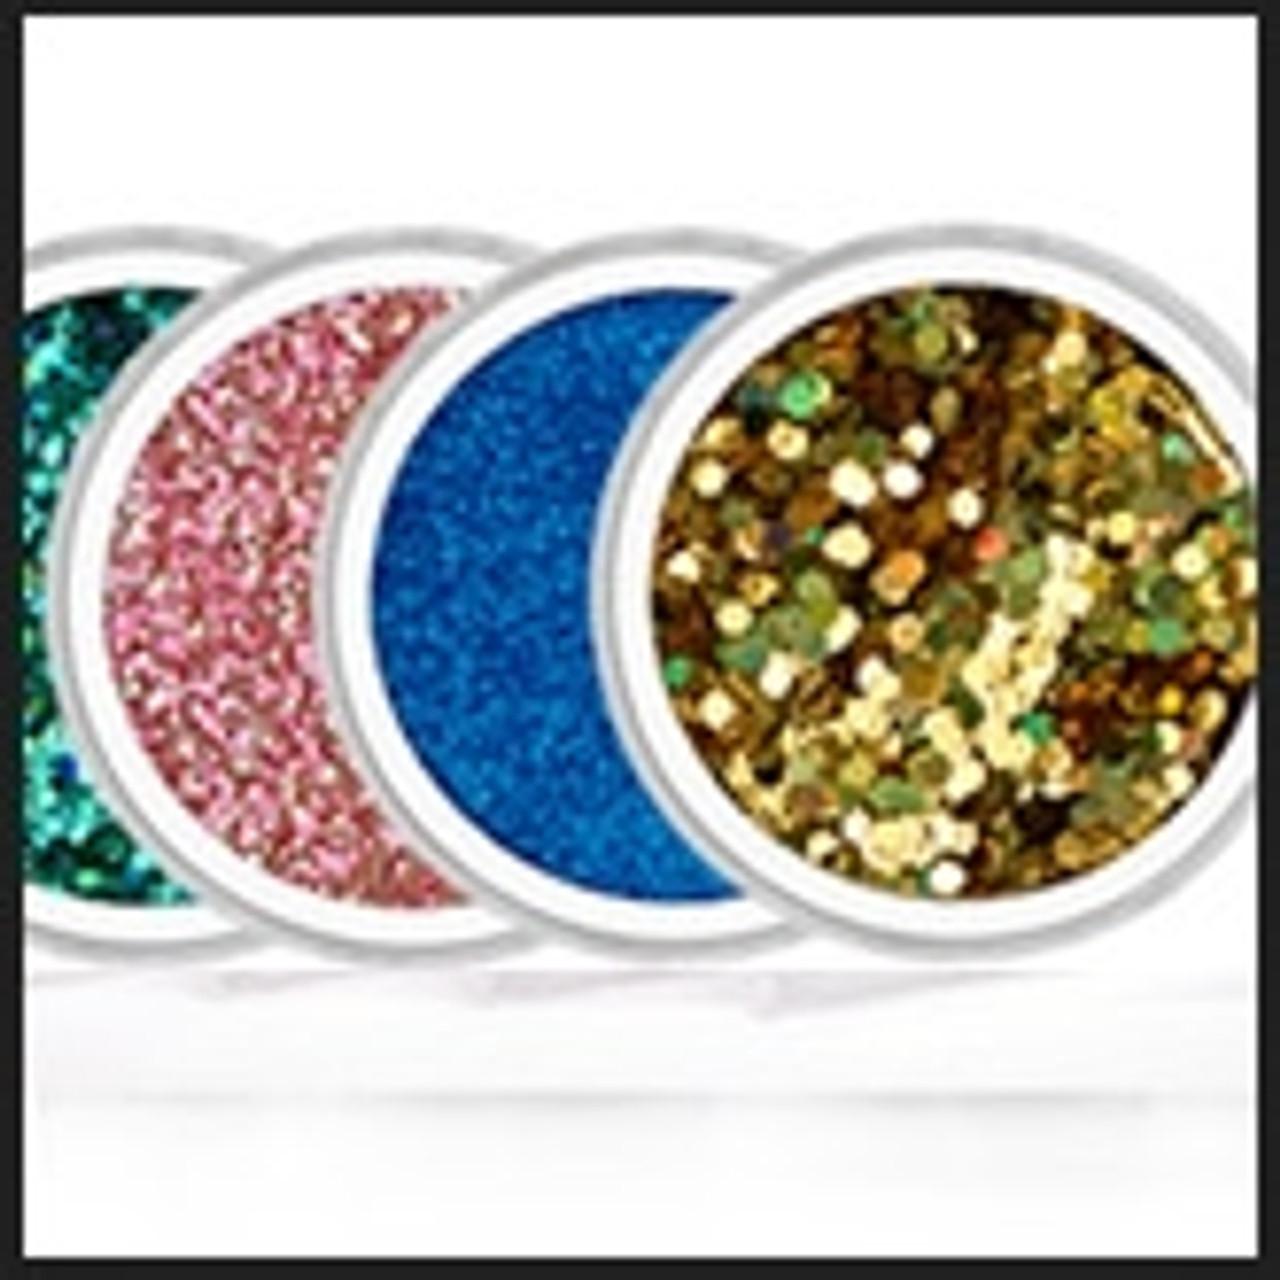 Nail Gems & Glitter Pots